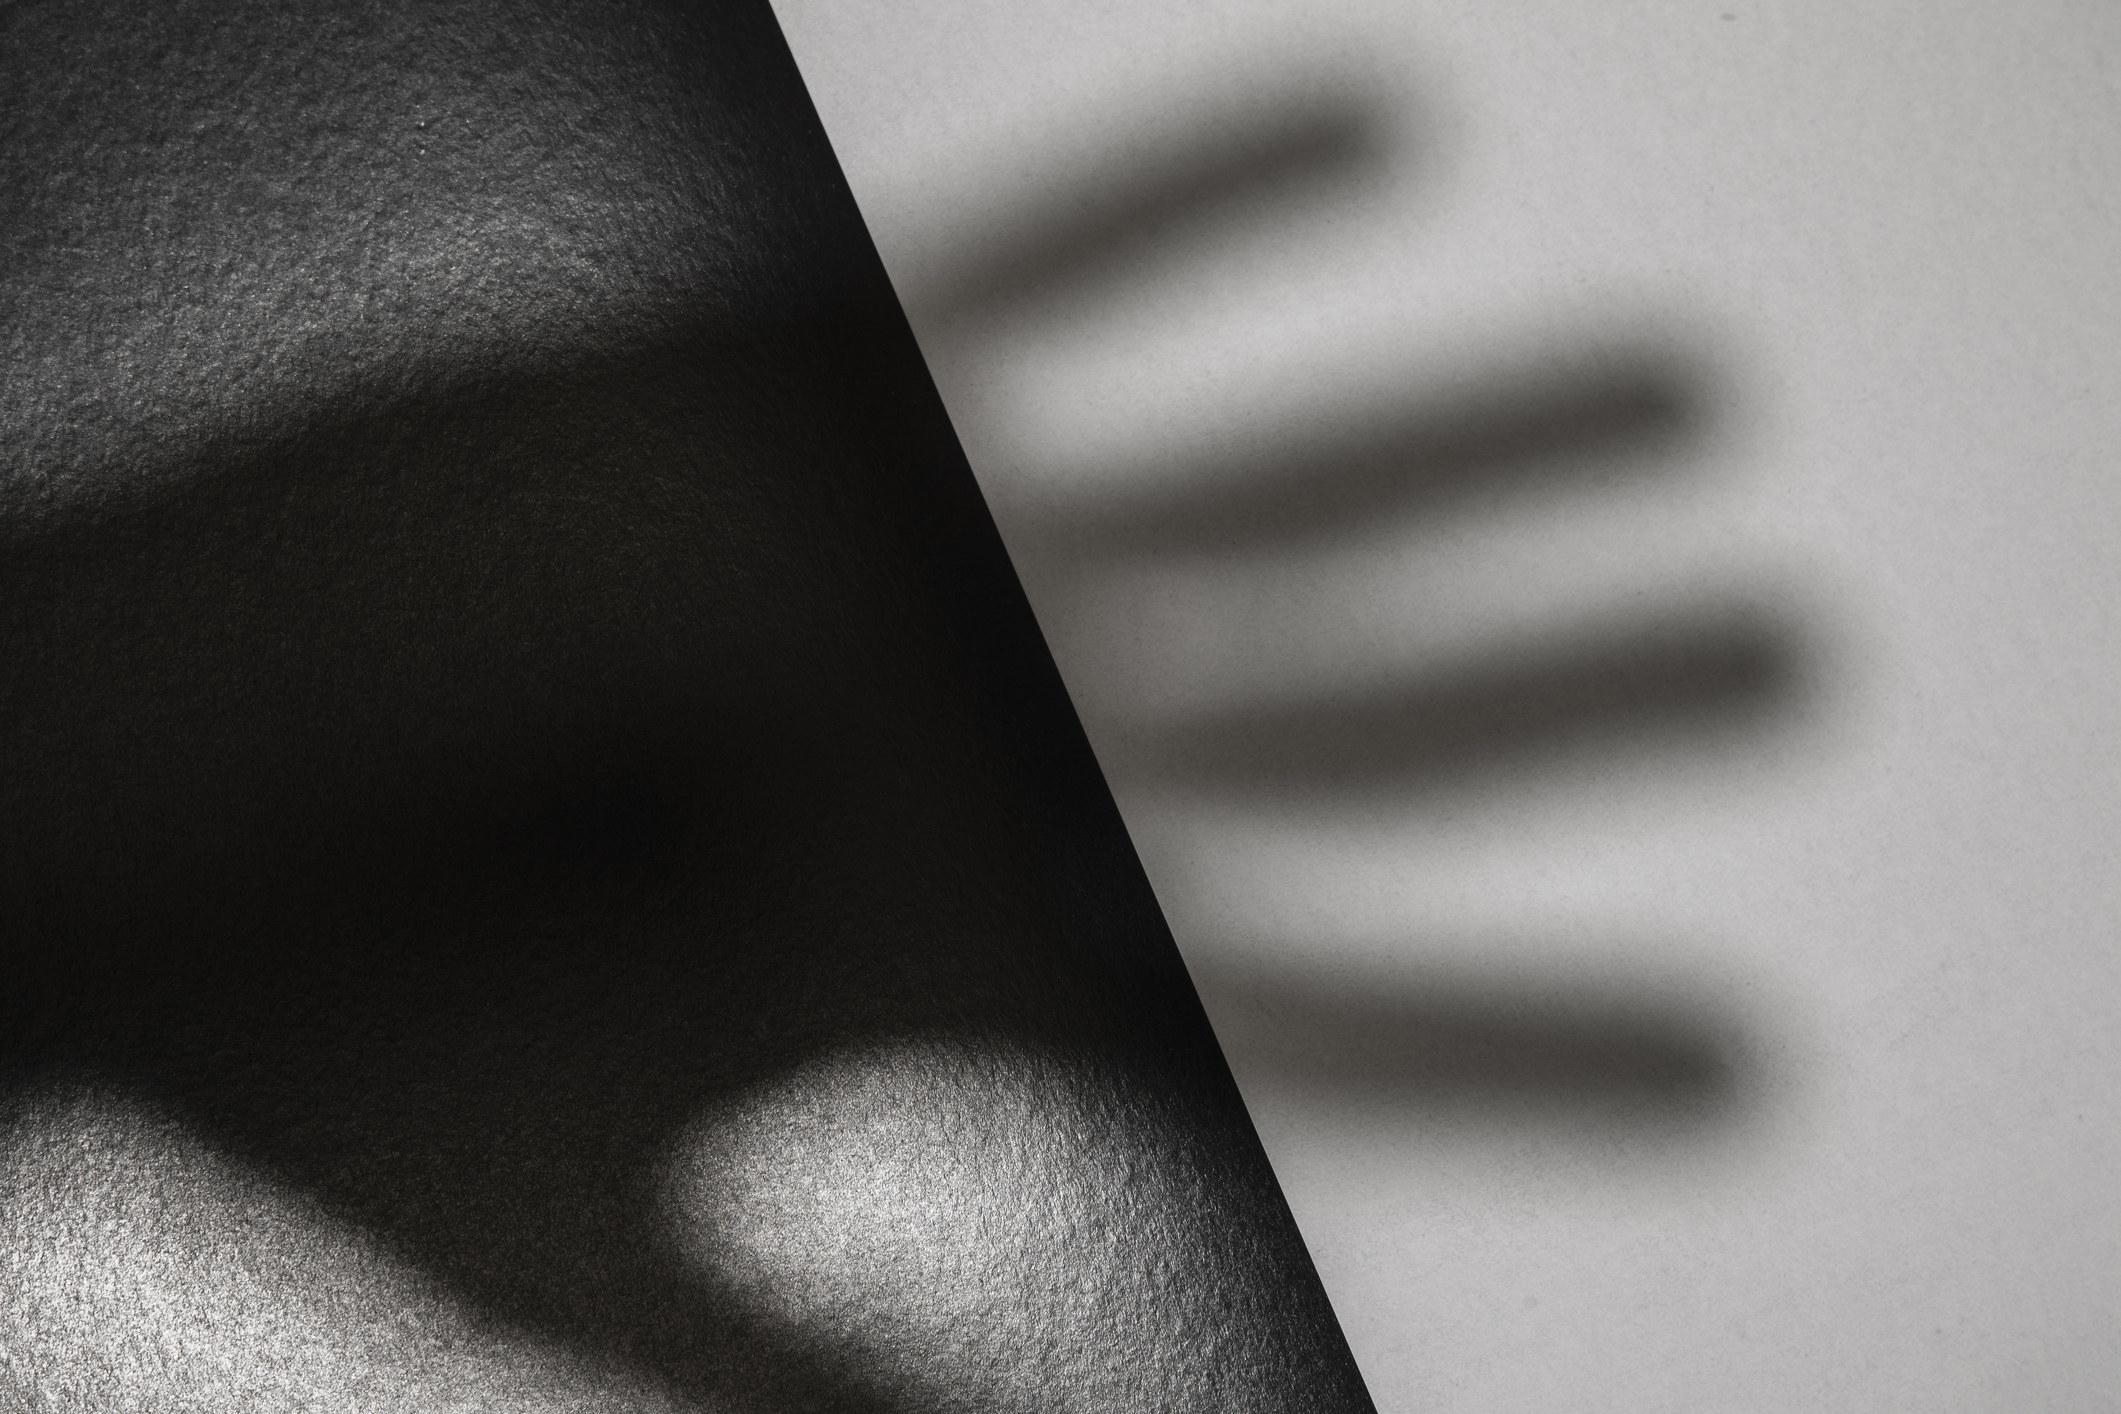 Creepy shadow of a hand